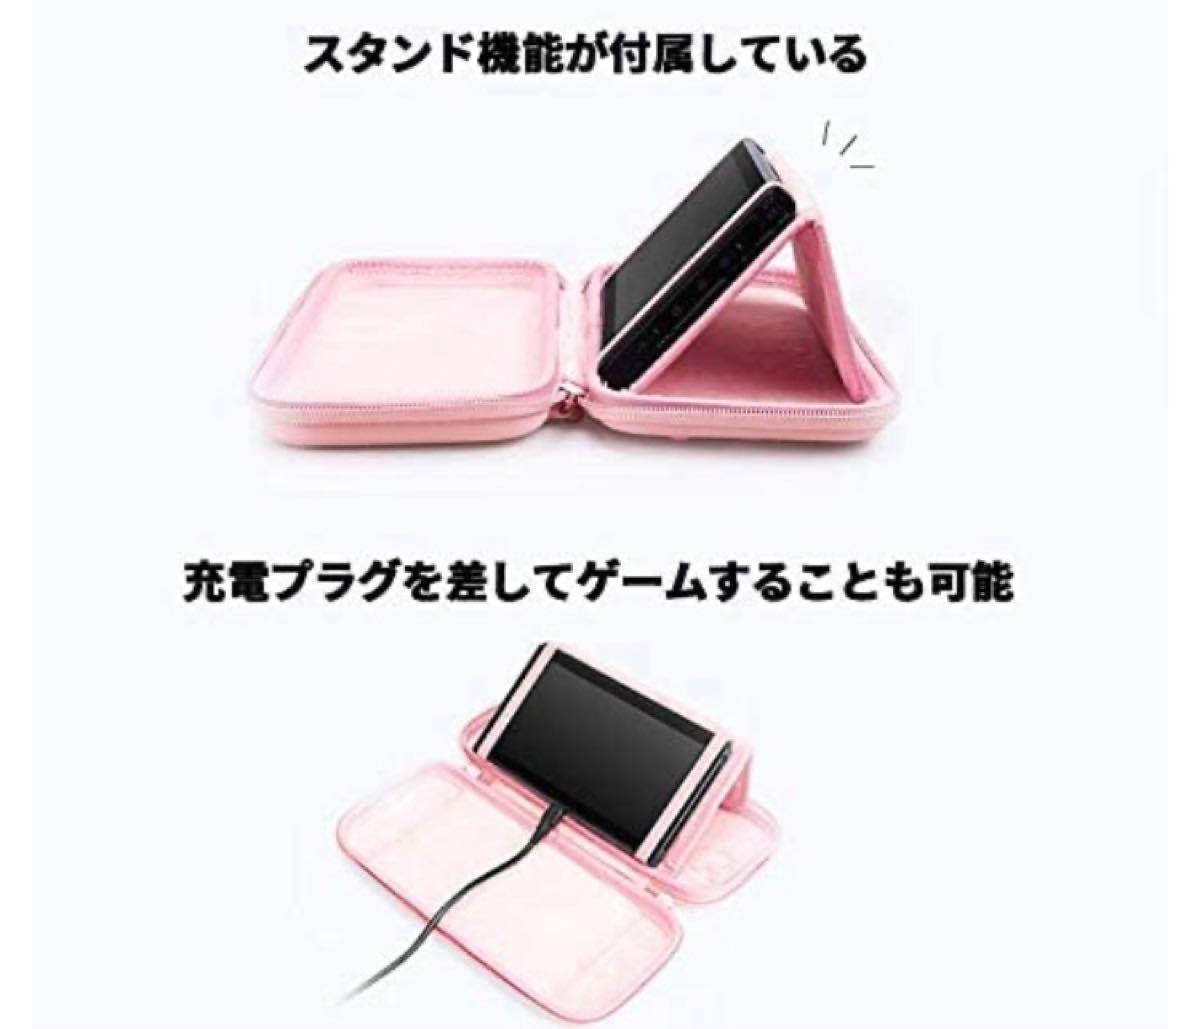 Nintendo Switch スイッチケースカバー スタンド